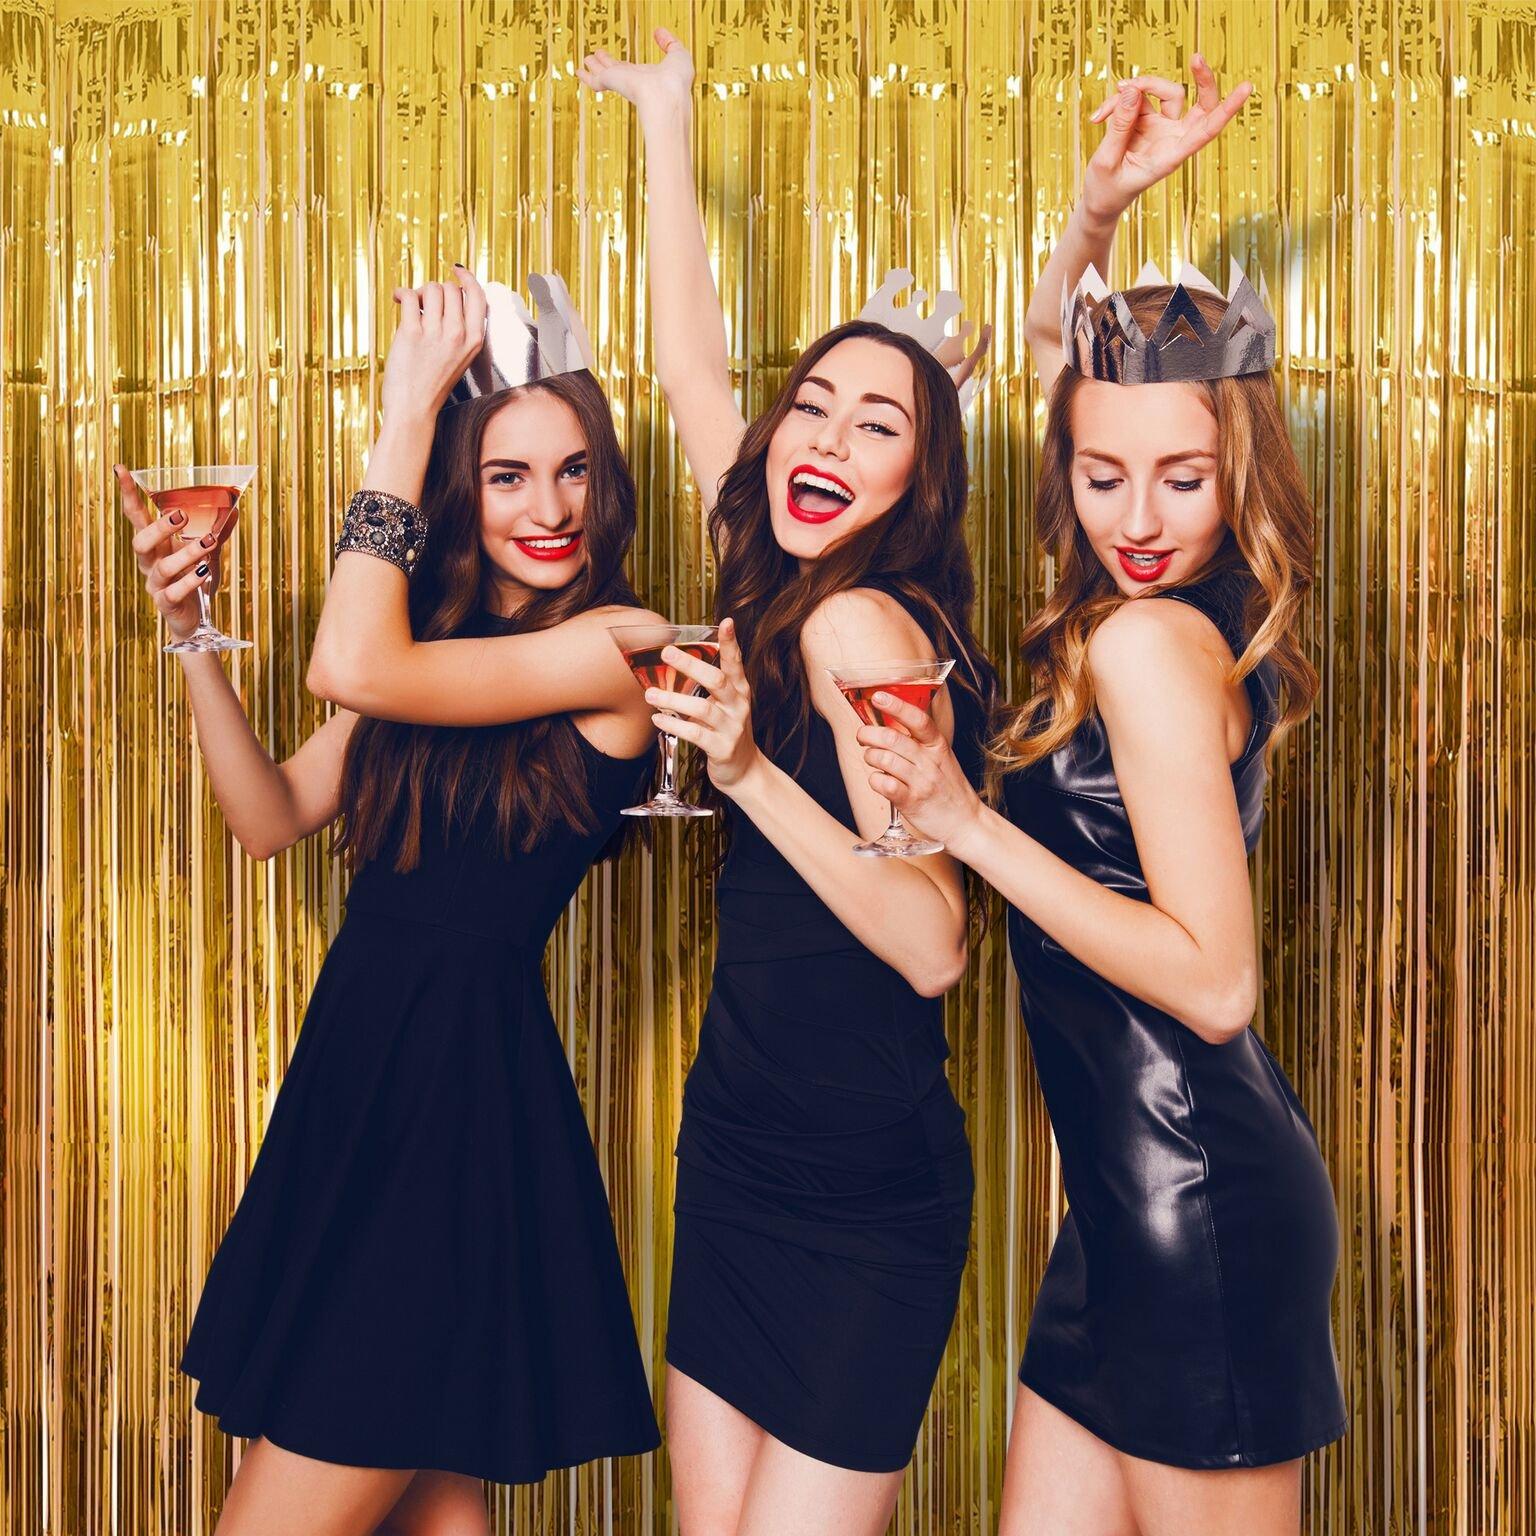 Amazon.com: 40inch Gold 2019 Balloons Graduation Party